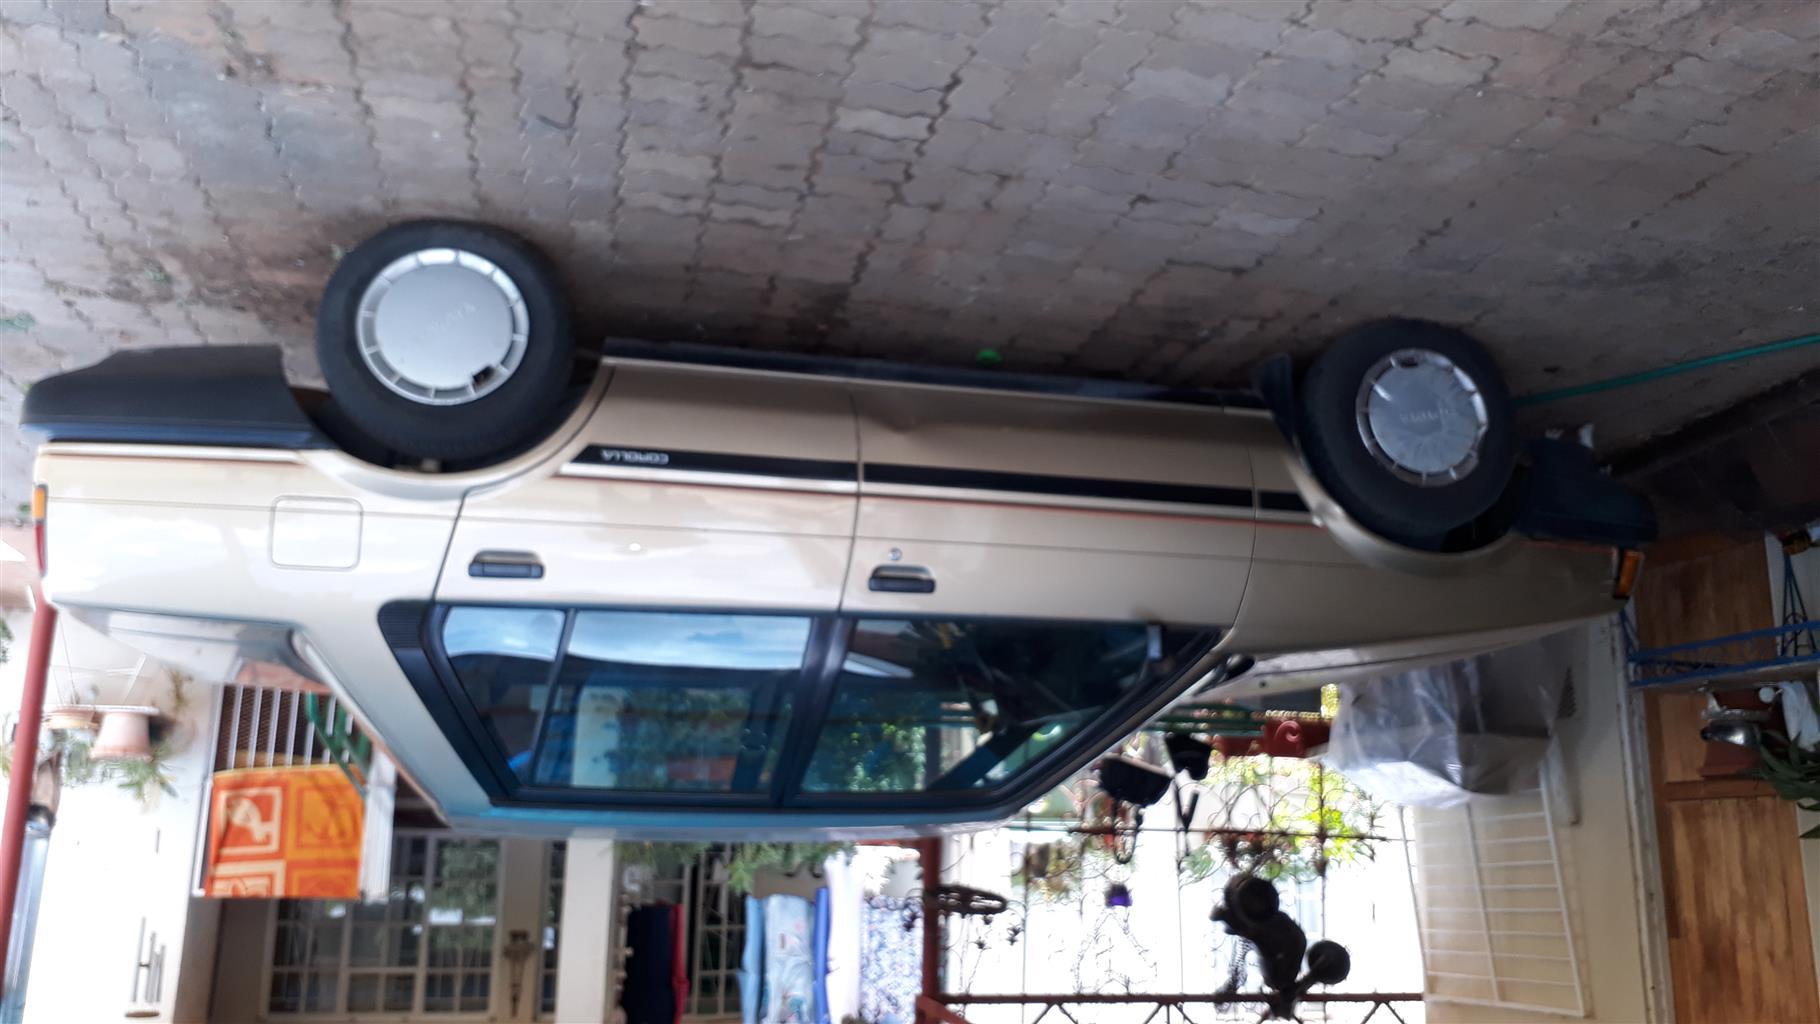 1984 Toyota Corolla 1.6 Advanced automatic